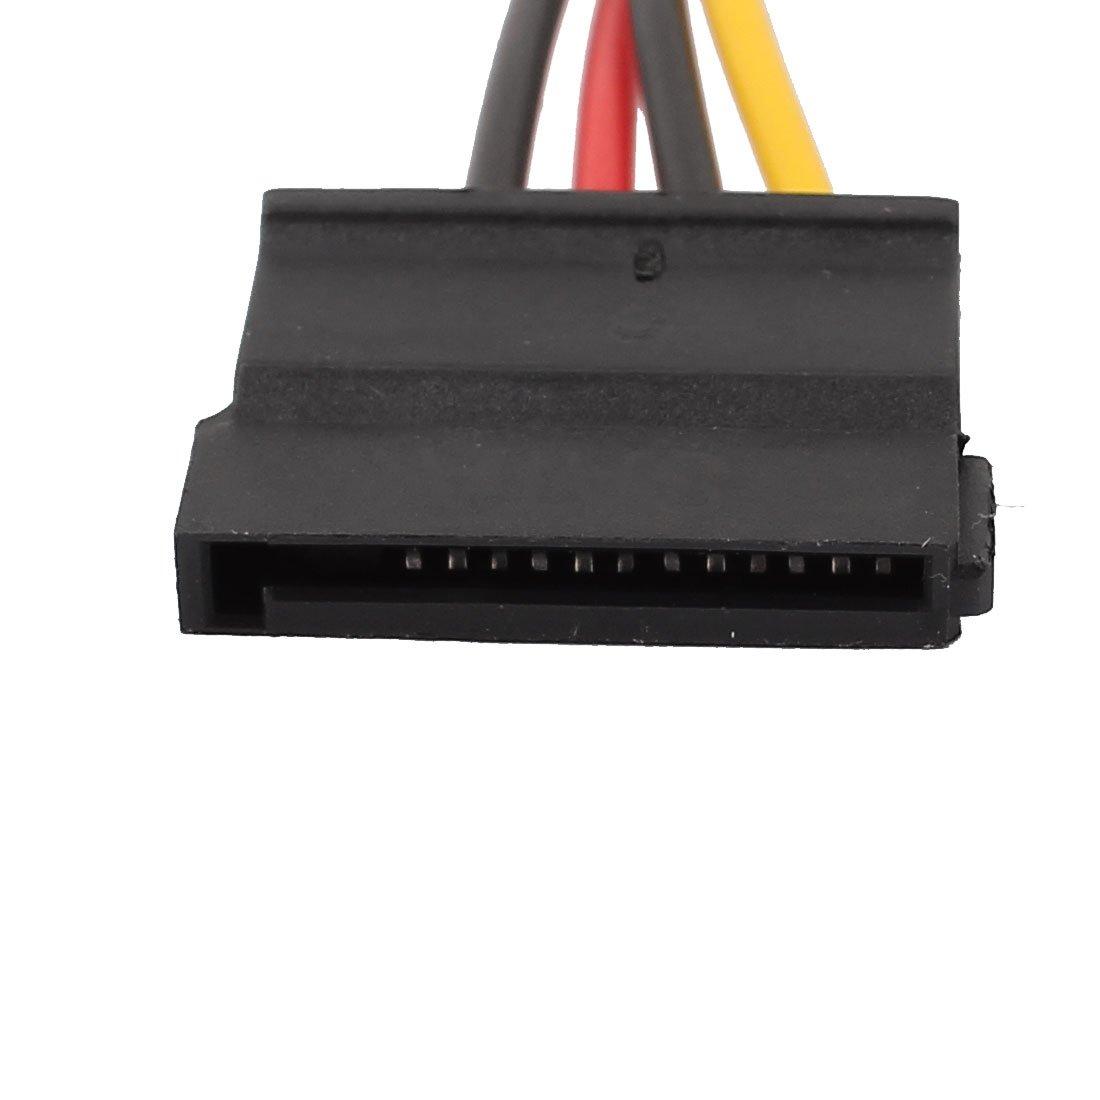 Inductor Power Shielded Drum Core 149.2uH//150uH 30/% 100KHz Ferrite 1.26A 298mOhm DCR T//R 25 Items DR1050-151-R